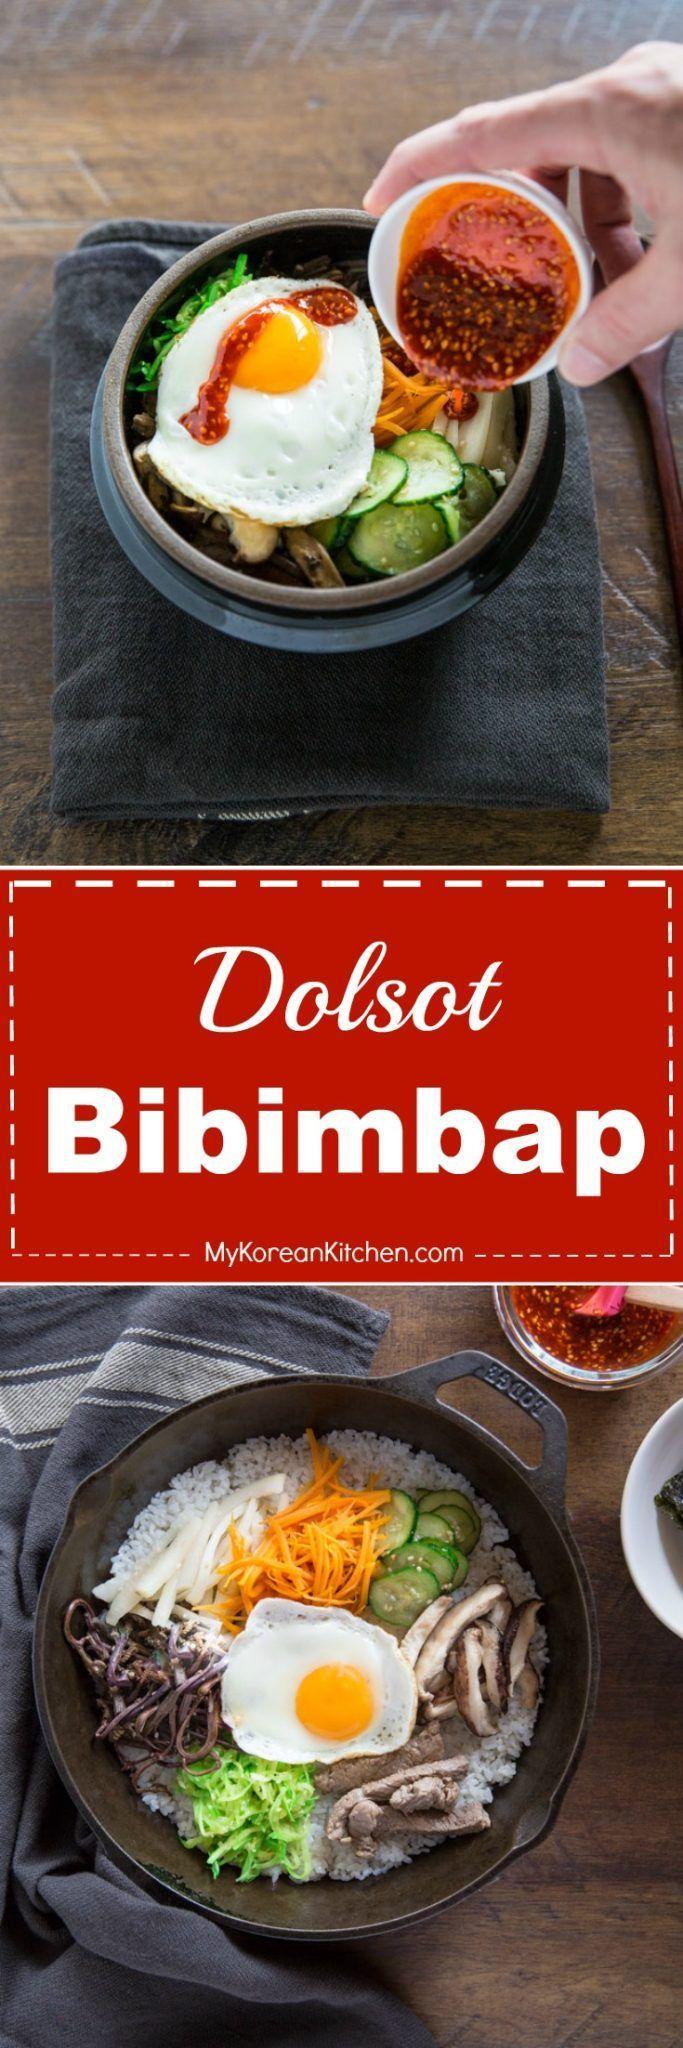 Dolsot Bibimbap Recipe. Learn how to make crispy Korean bibimbap with or without a Korean hot stone bowl. | MyKoreanKitchen.com   #bibimbap #koreanfood #gochujang #onebowlmeal